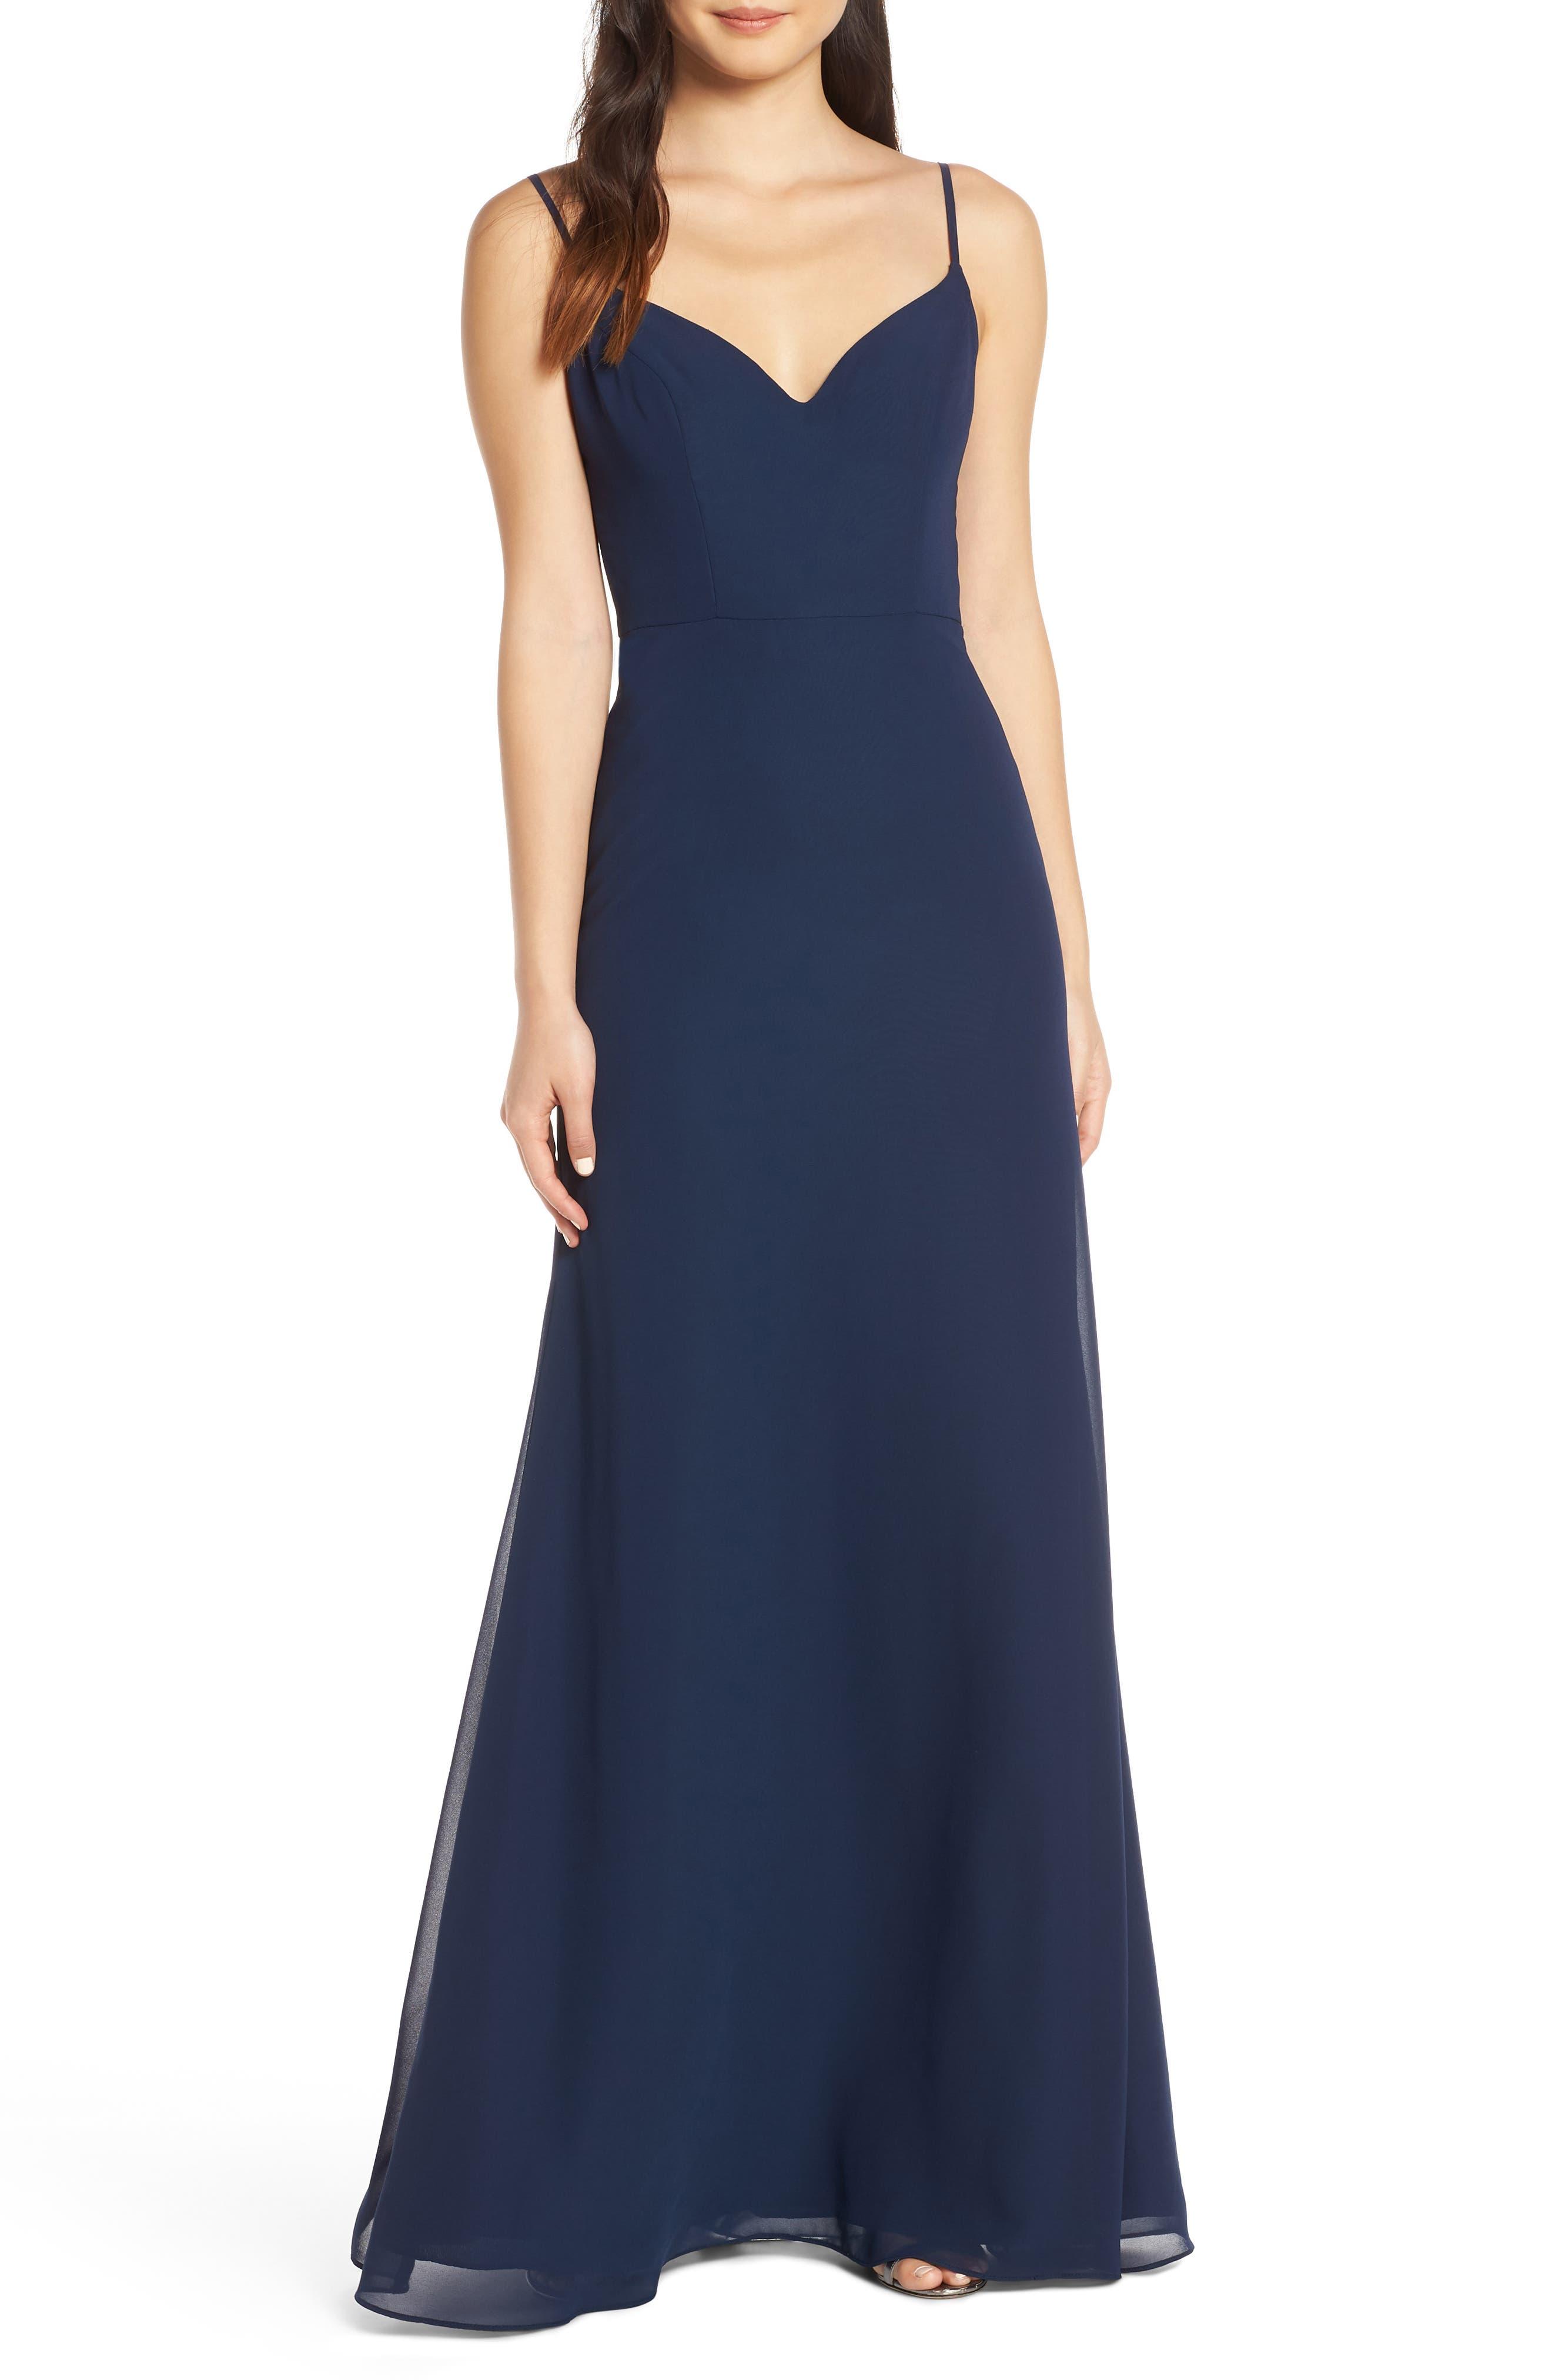 Hayley Paige Occasions V-Neck Chiffon Evening Dress, Blue